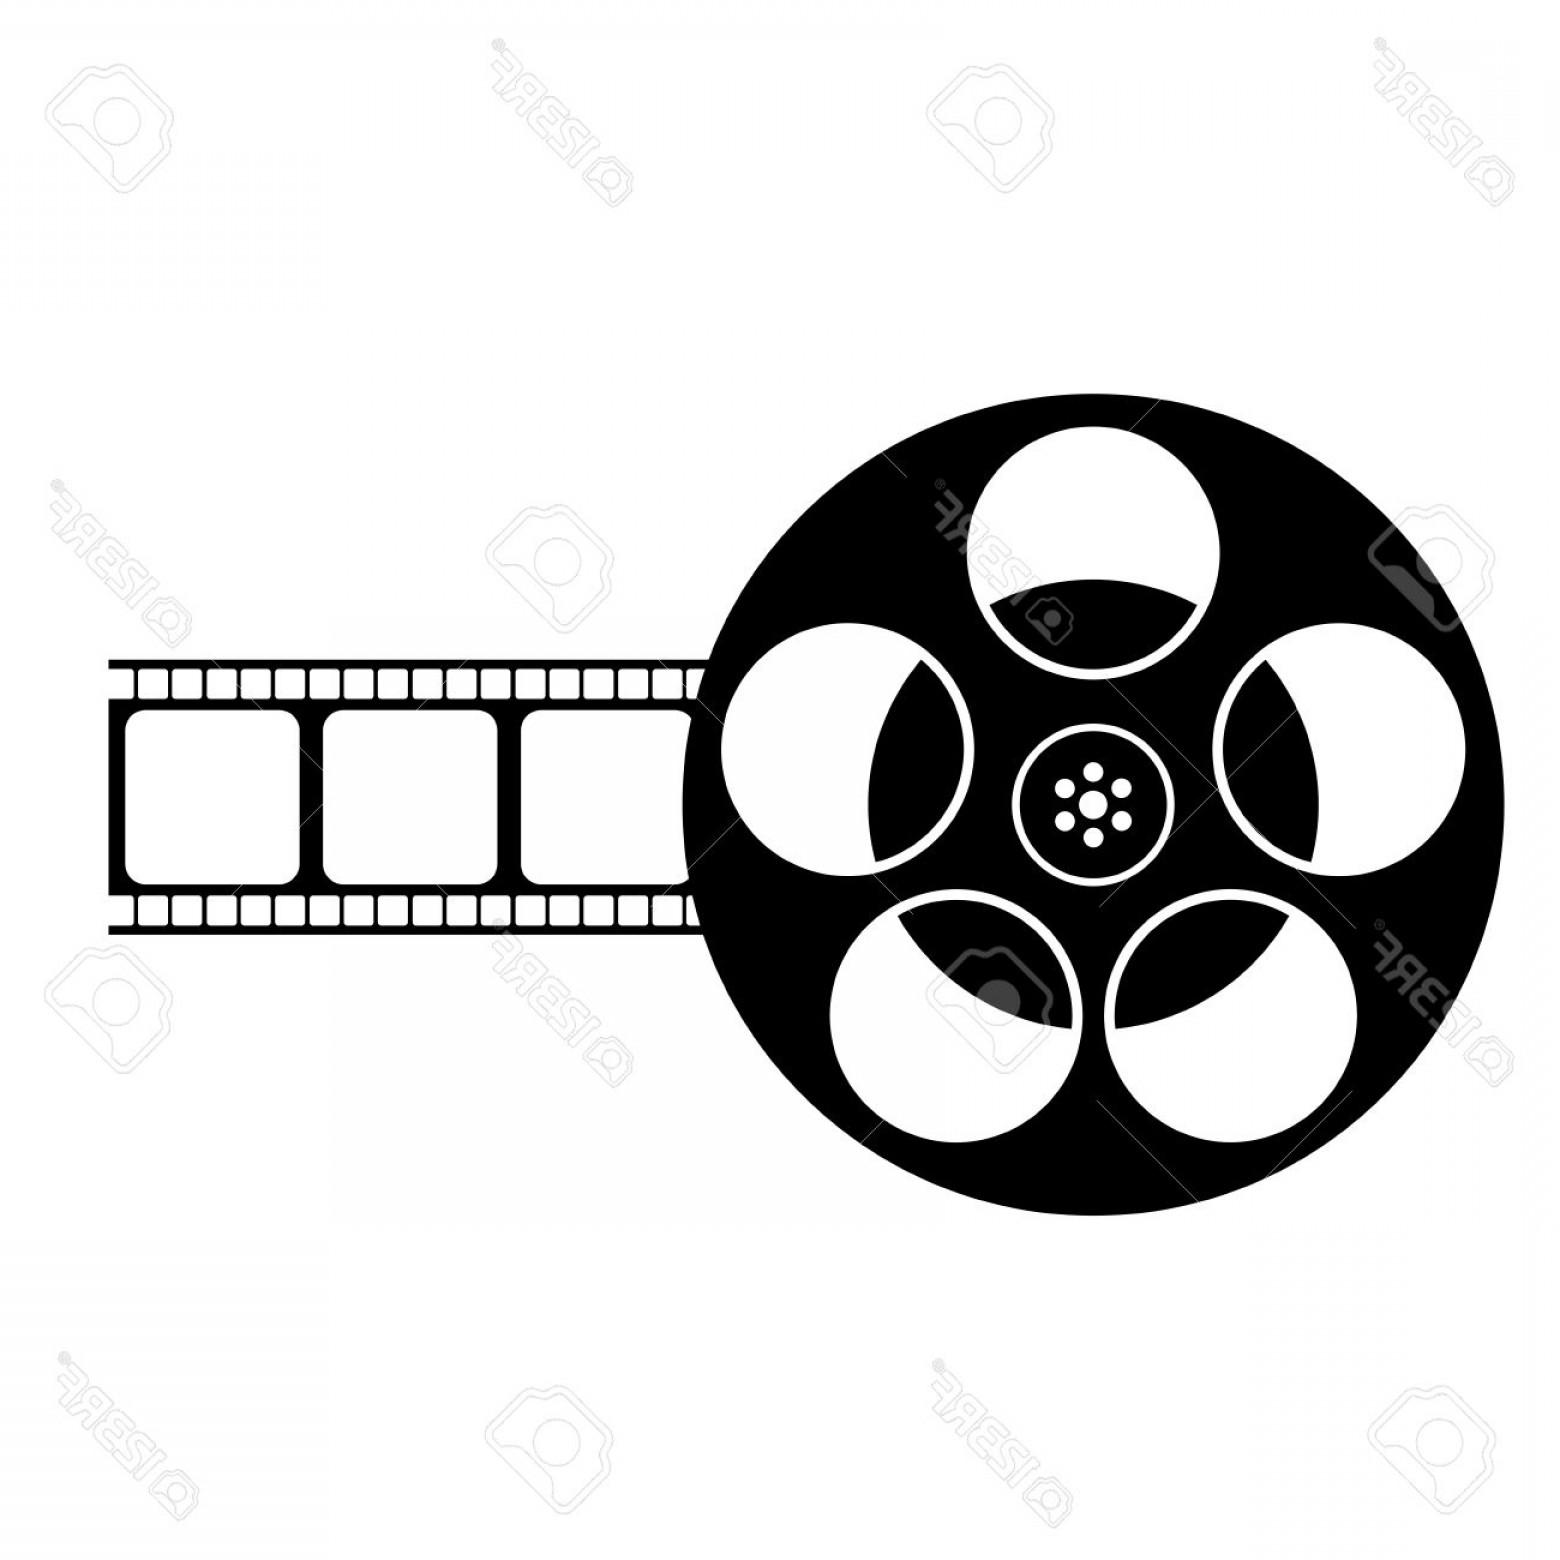 Film Reel Clipart Black And White.